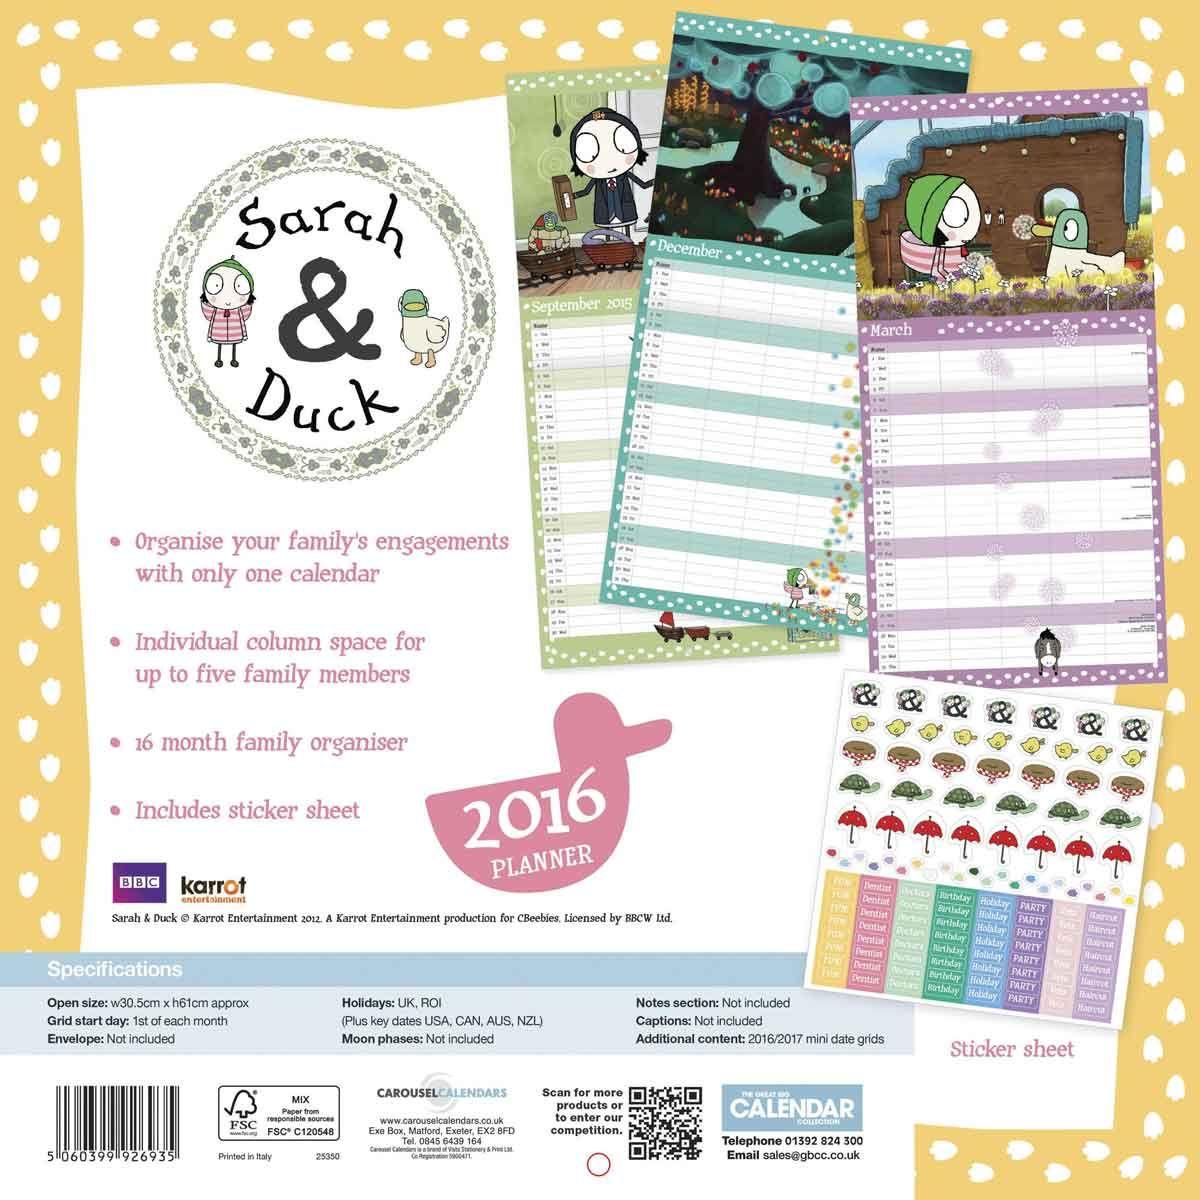 sarah duck family planner 2015 2016 calendar club uk